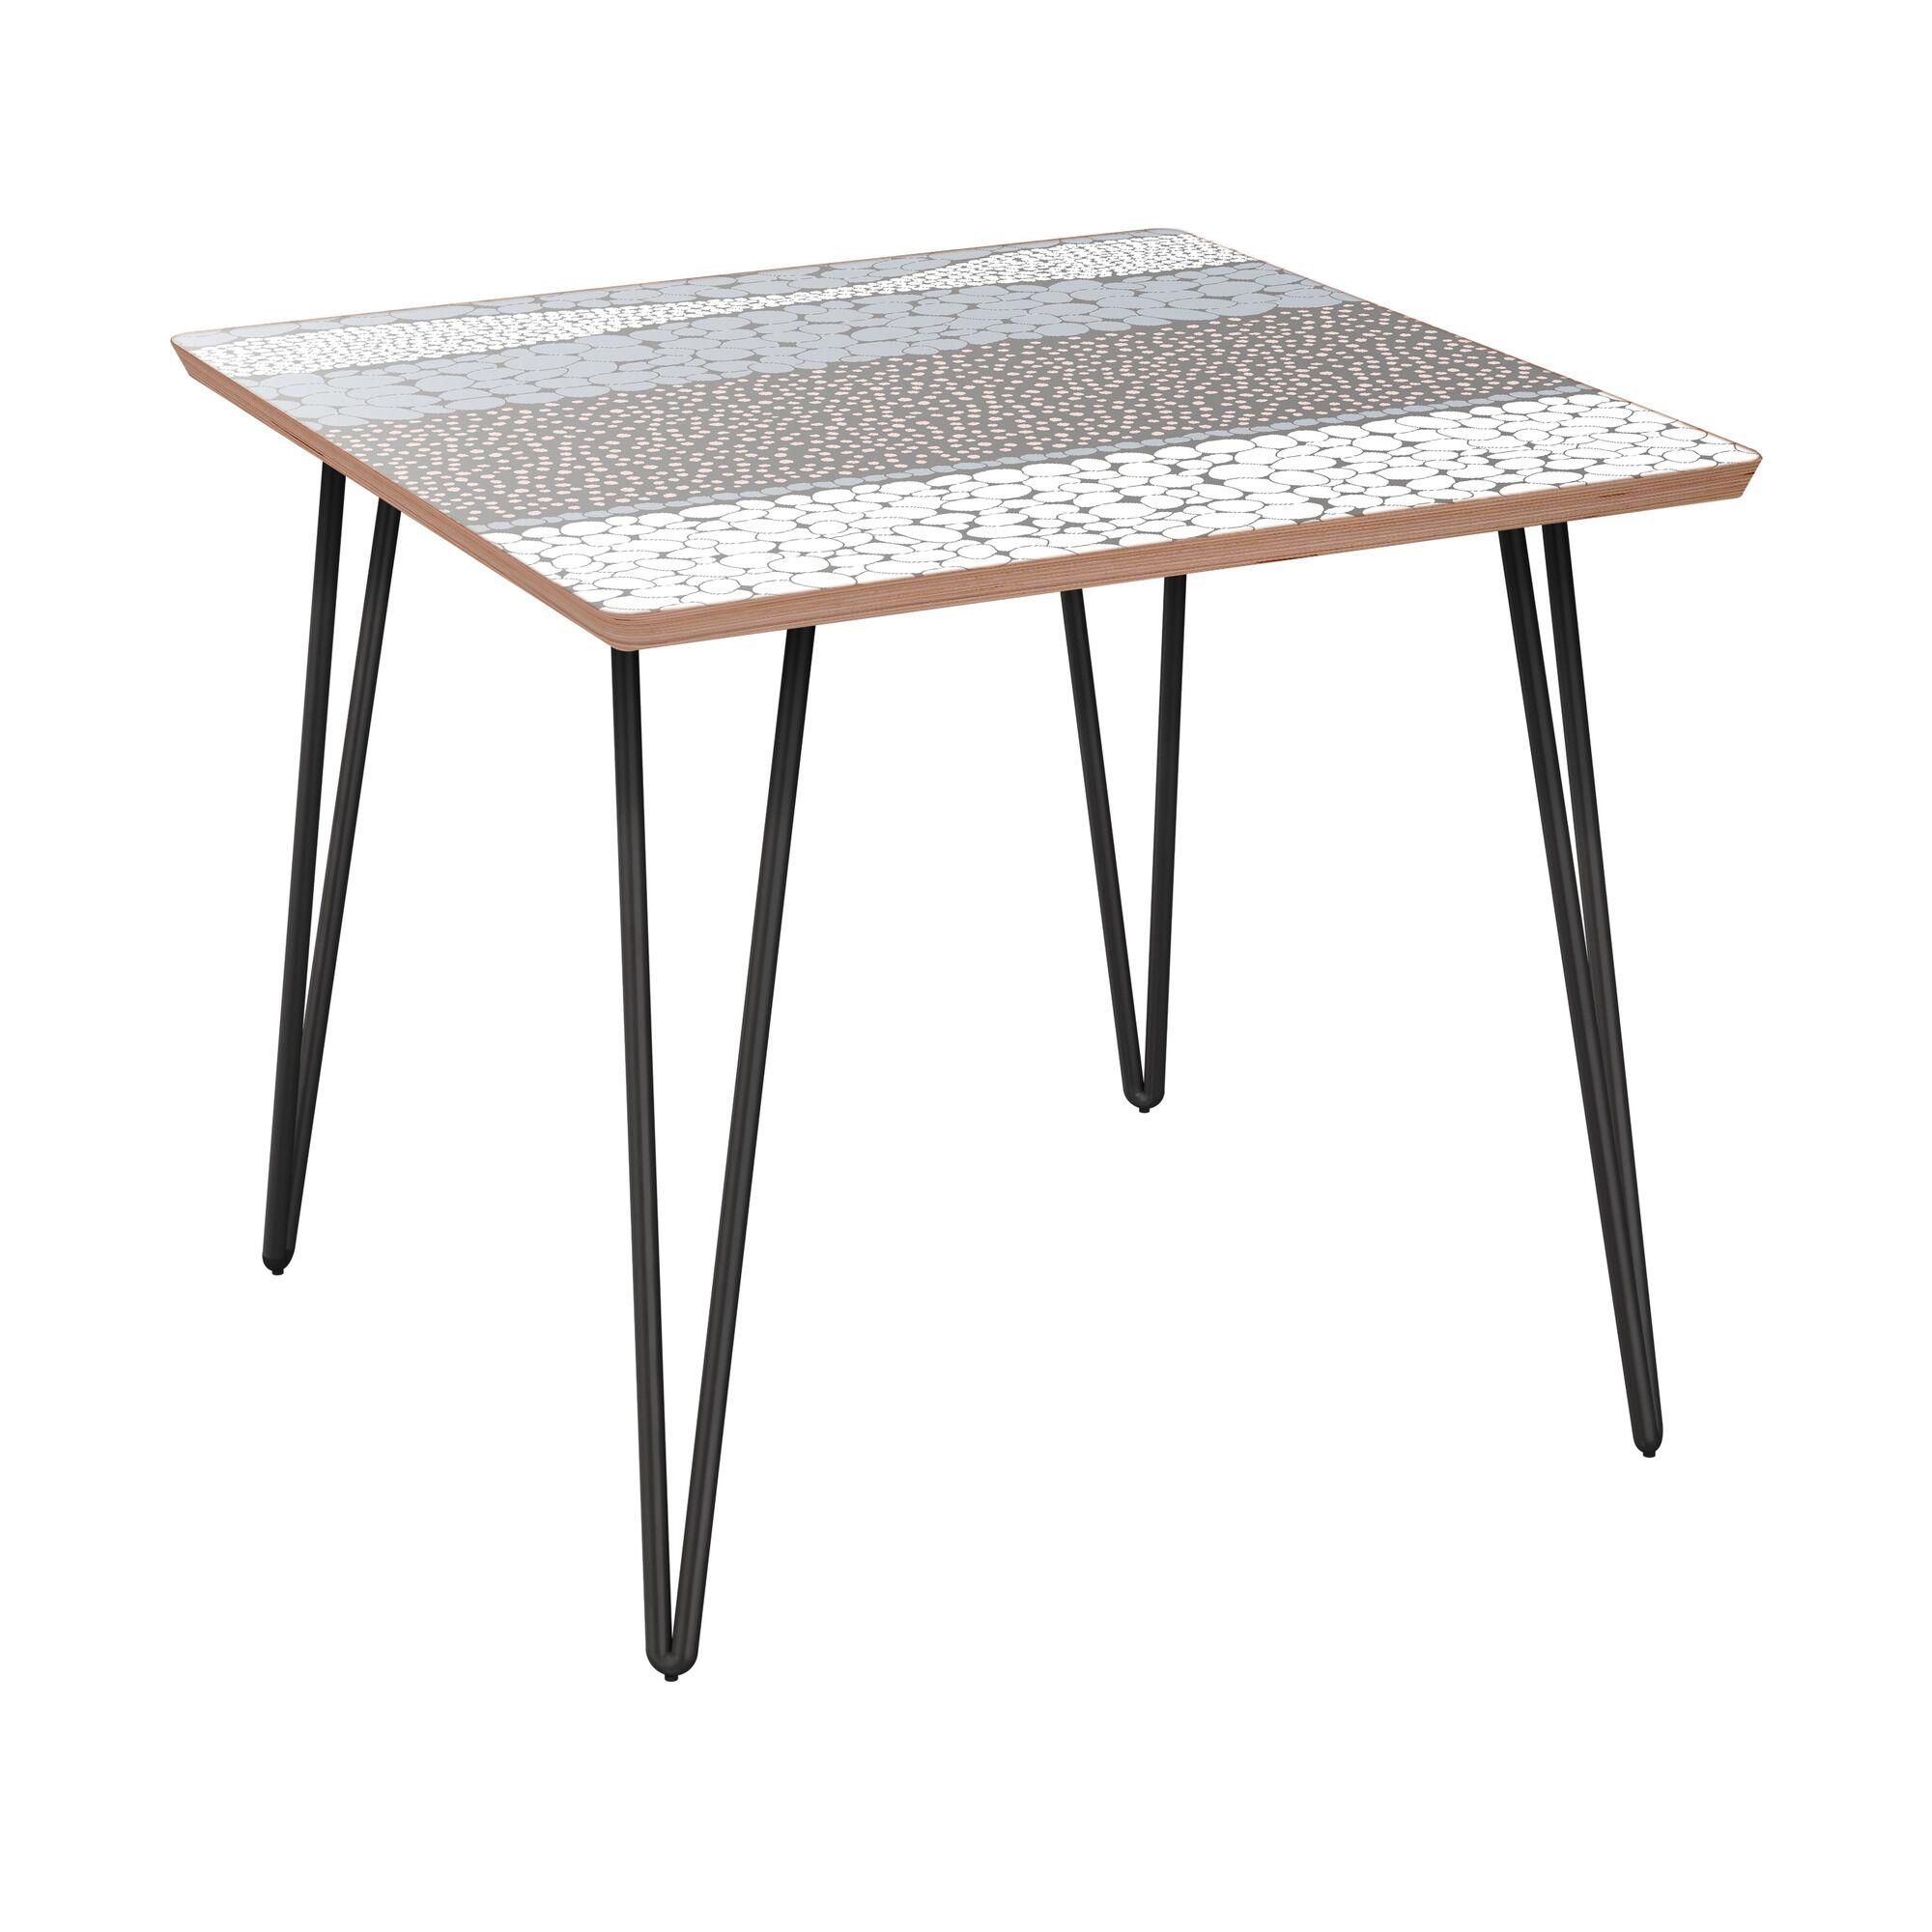 Gabriele End Table Table Base Color: Black, Table Top Color: Walnut